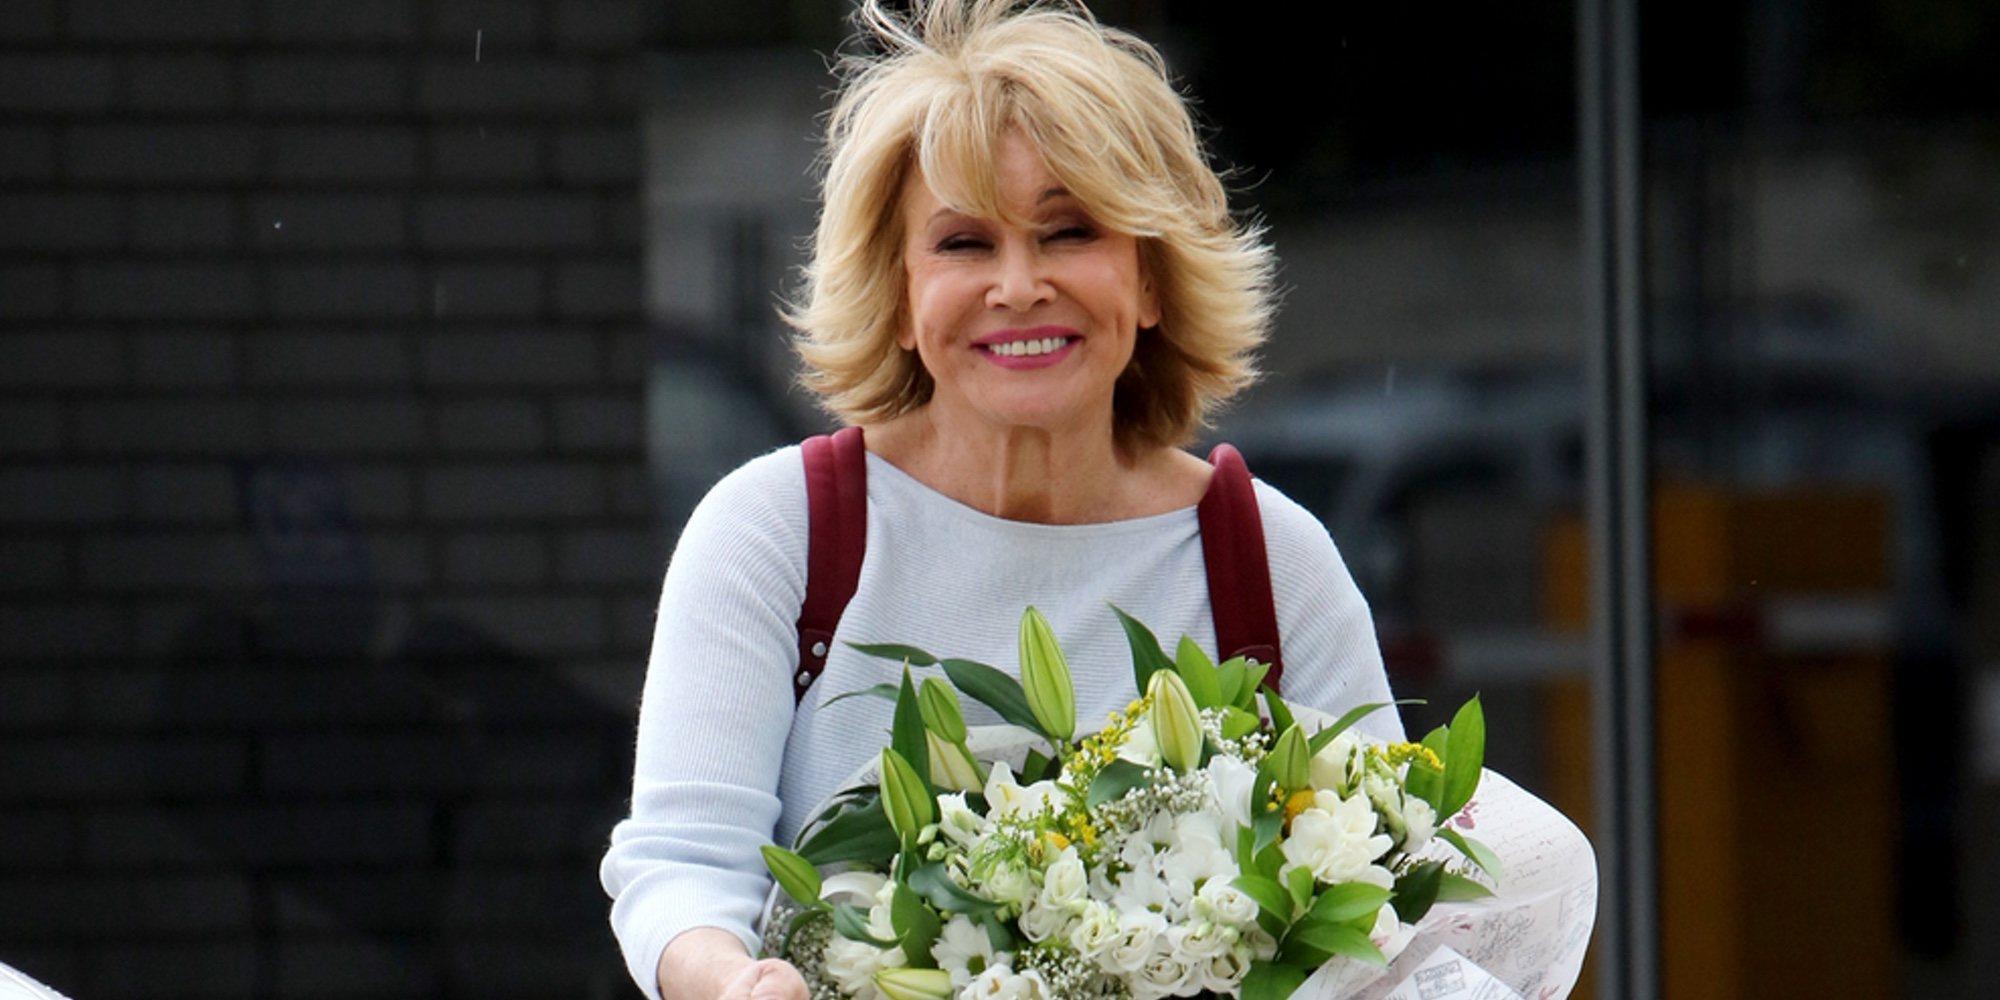 Mila Ximénez recibe un ramo de flores en 'Sálvame' para celebrar su 66 cumpleaños